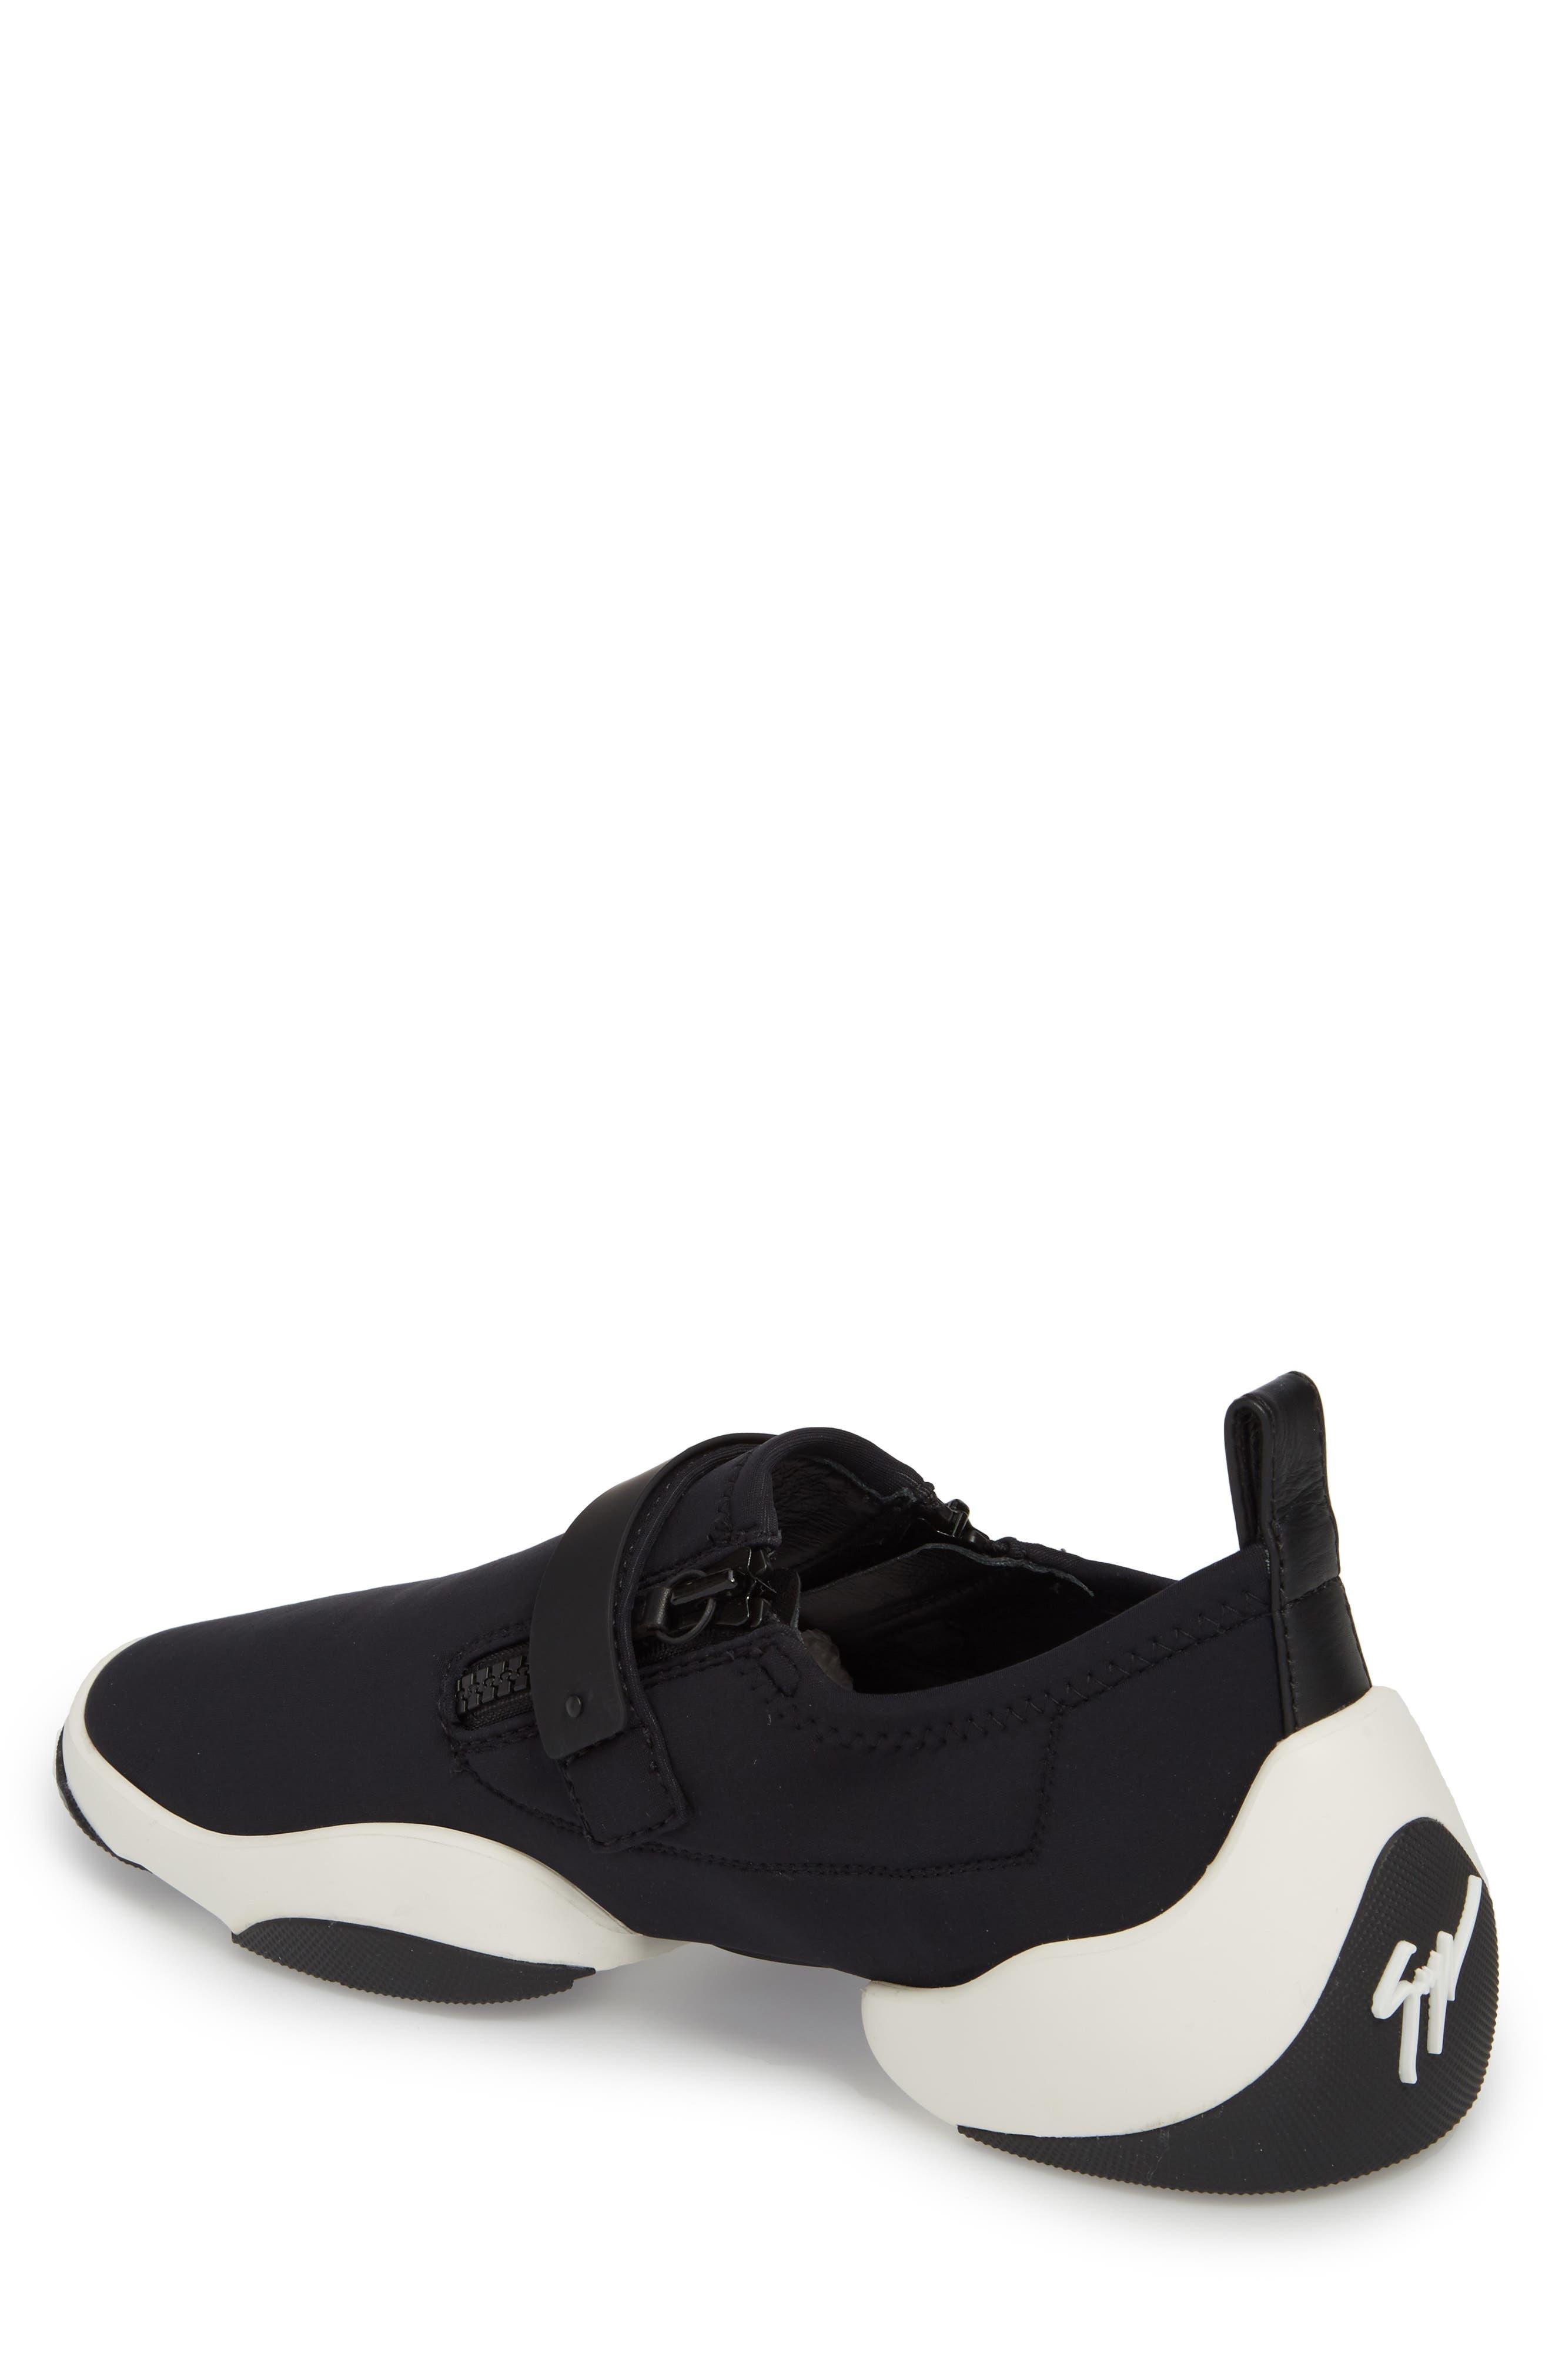 Scuba Strap Sneaker,                             Alternate thumbnail 2, color,                             001